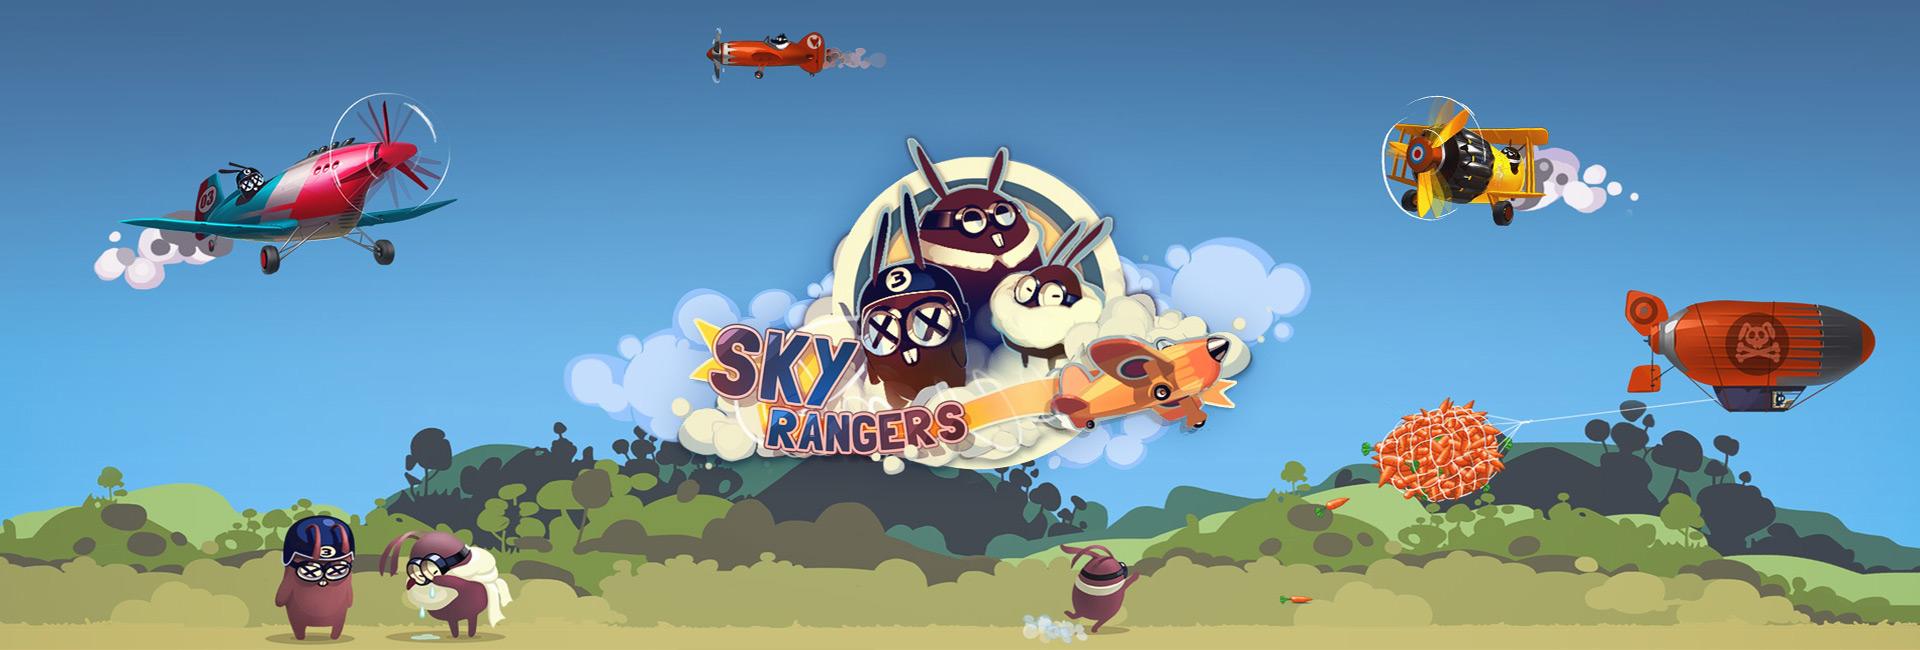 Sky Rangers